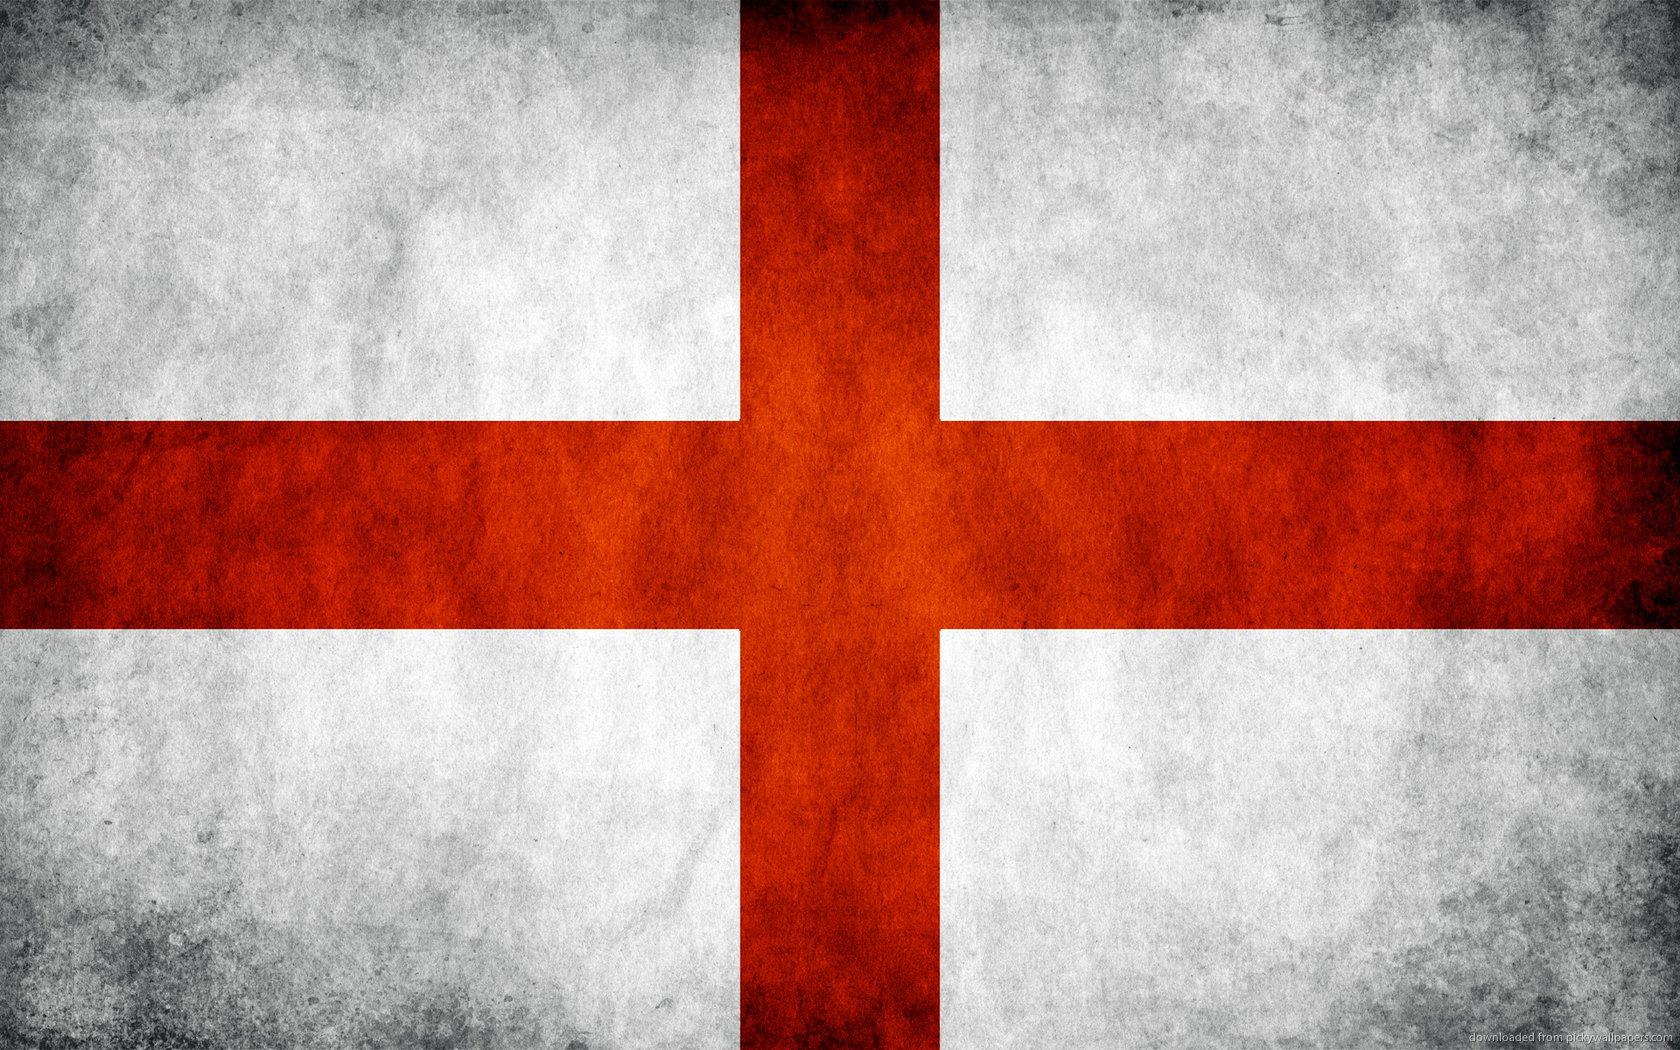 Download 1680x1050 England Flag Wallpaper 1680x1050